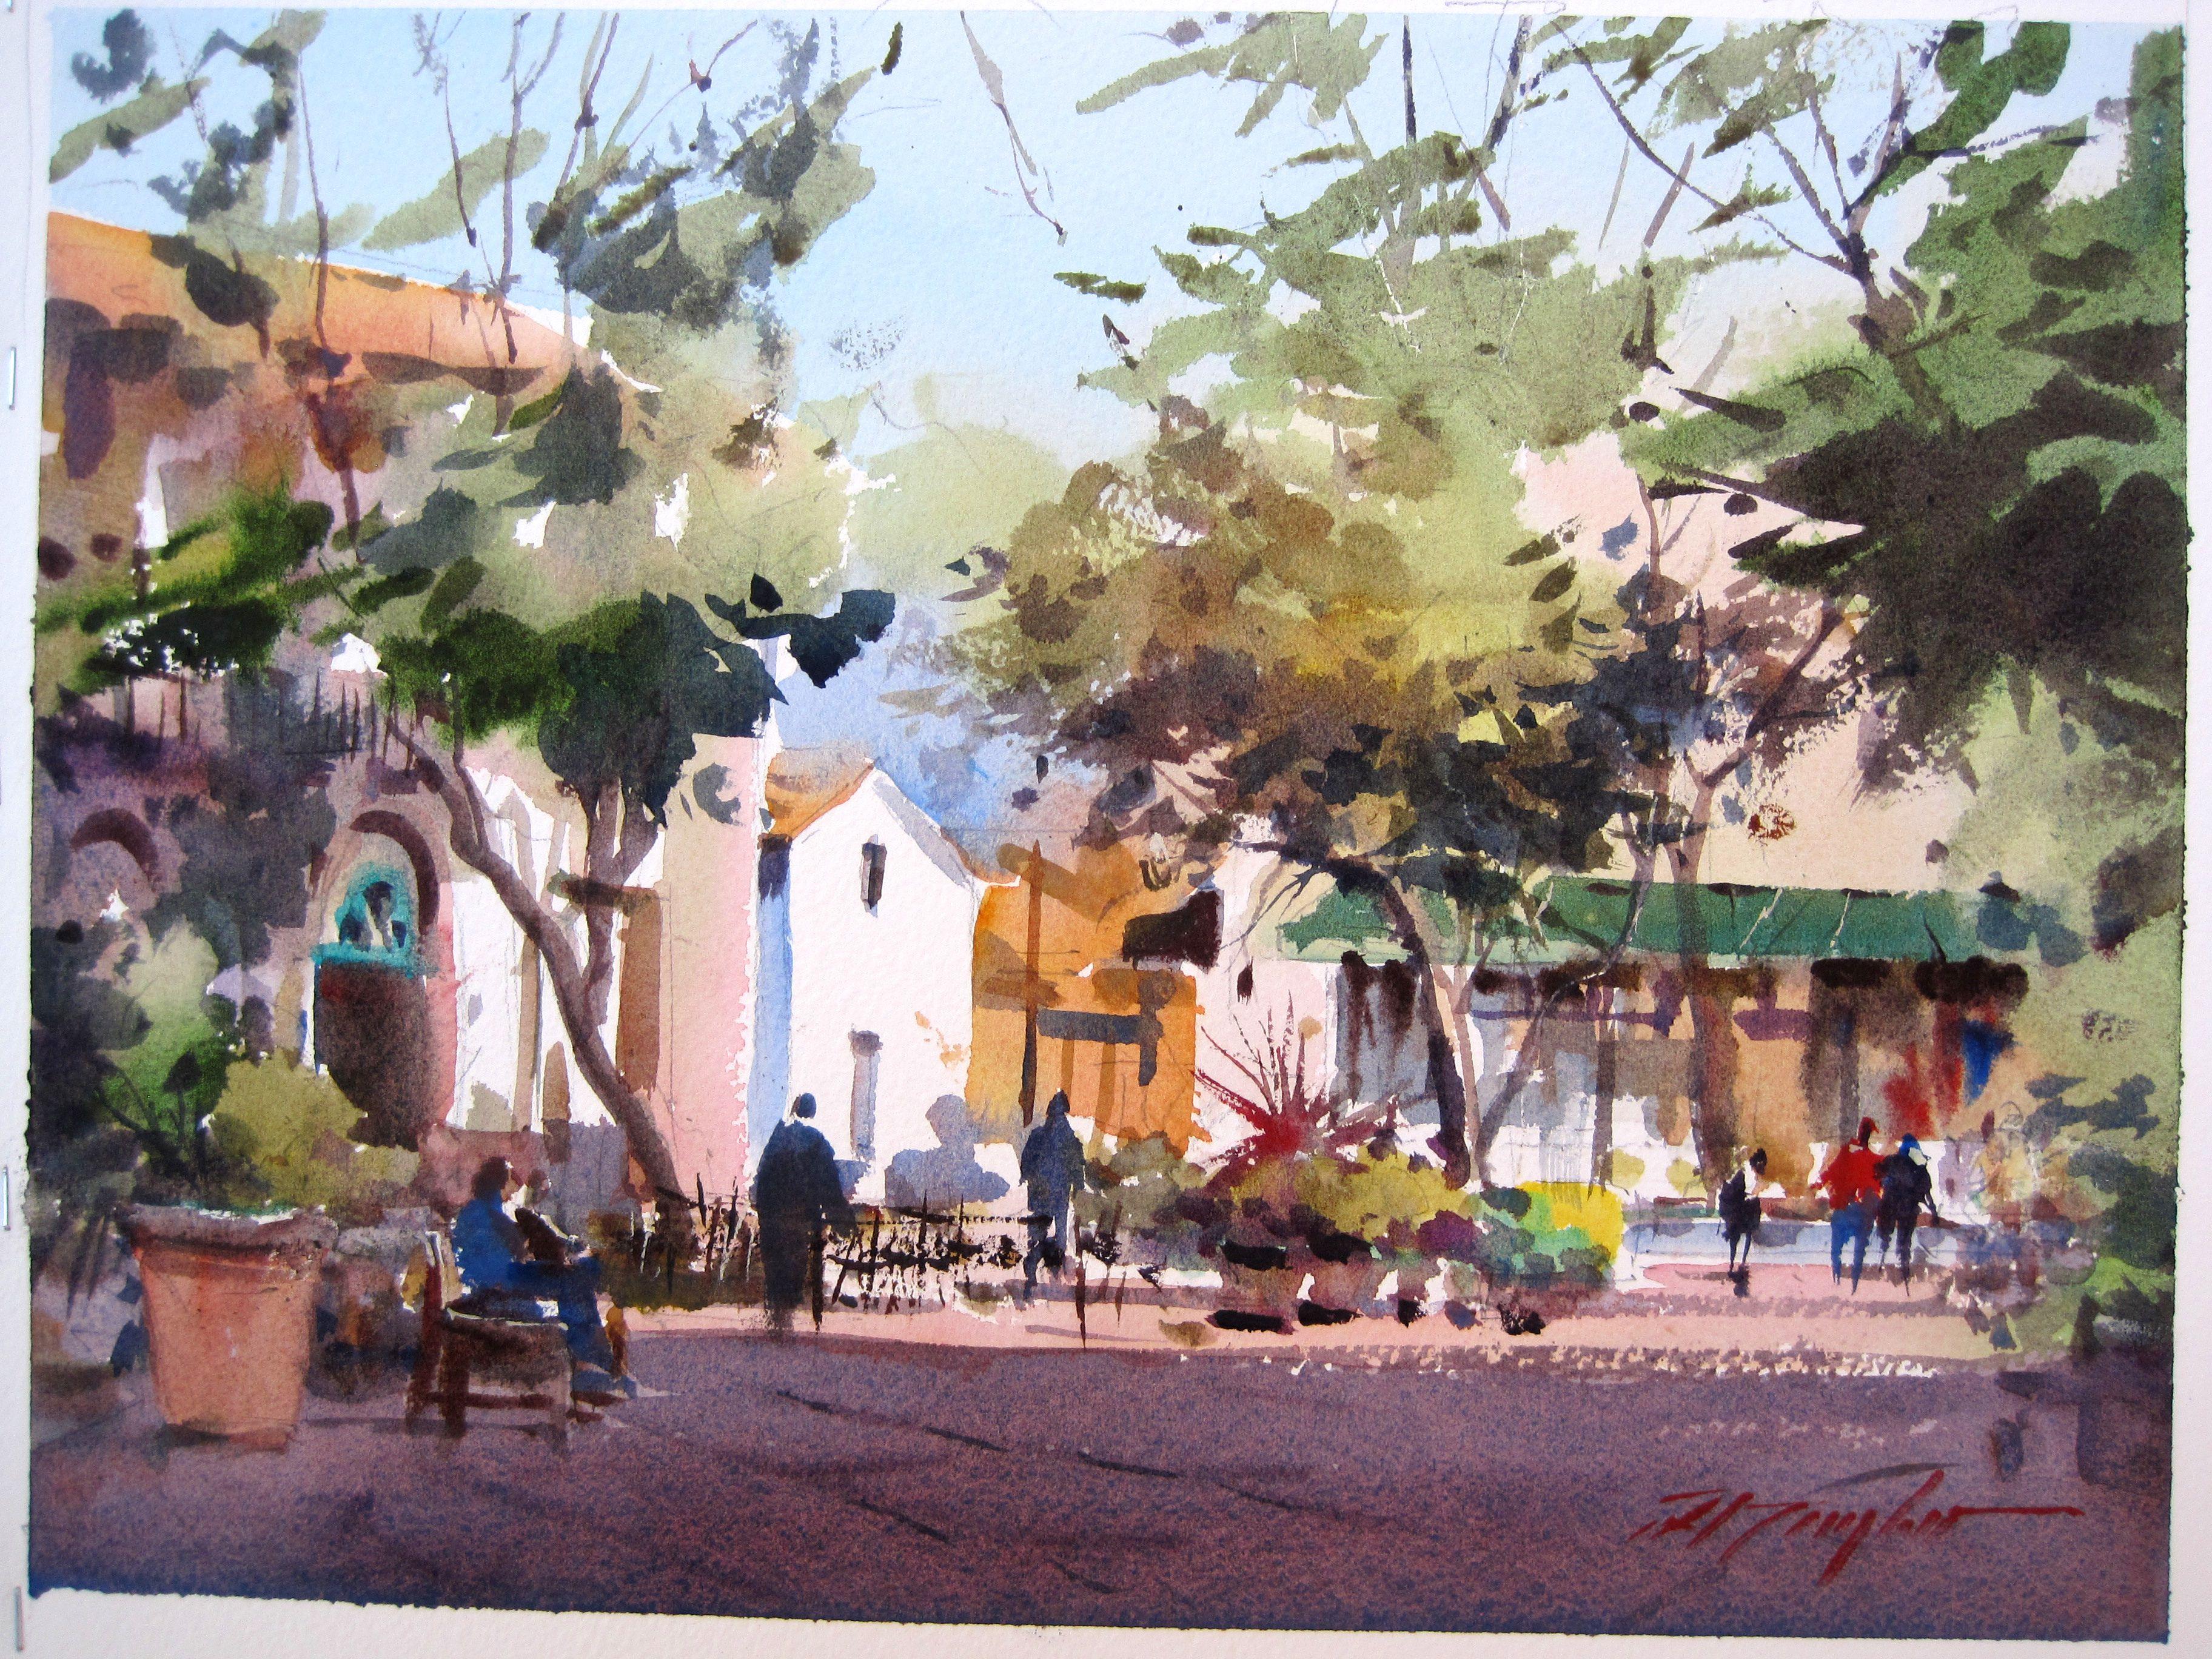 Watercolor artist magazine palm coast fl - David Taylor Plein Air Santa Barbara Watercolor Landscapewatercolour Paintinglandscape